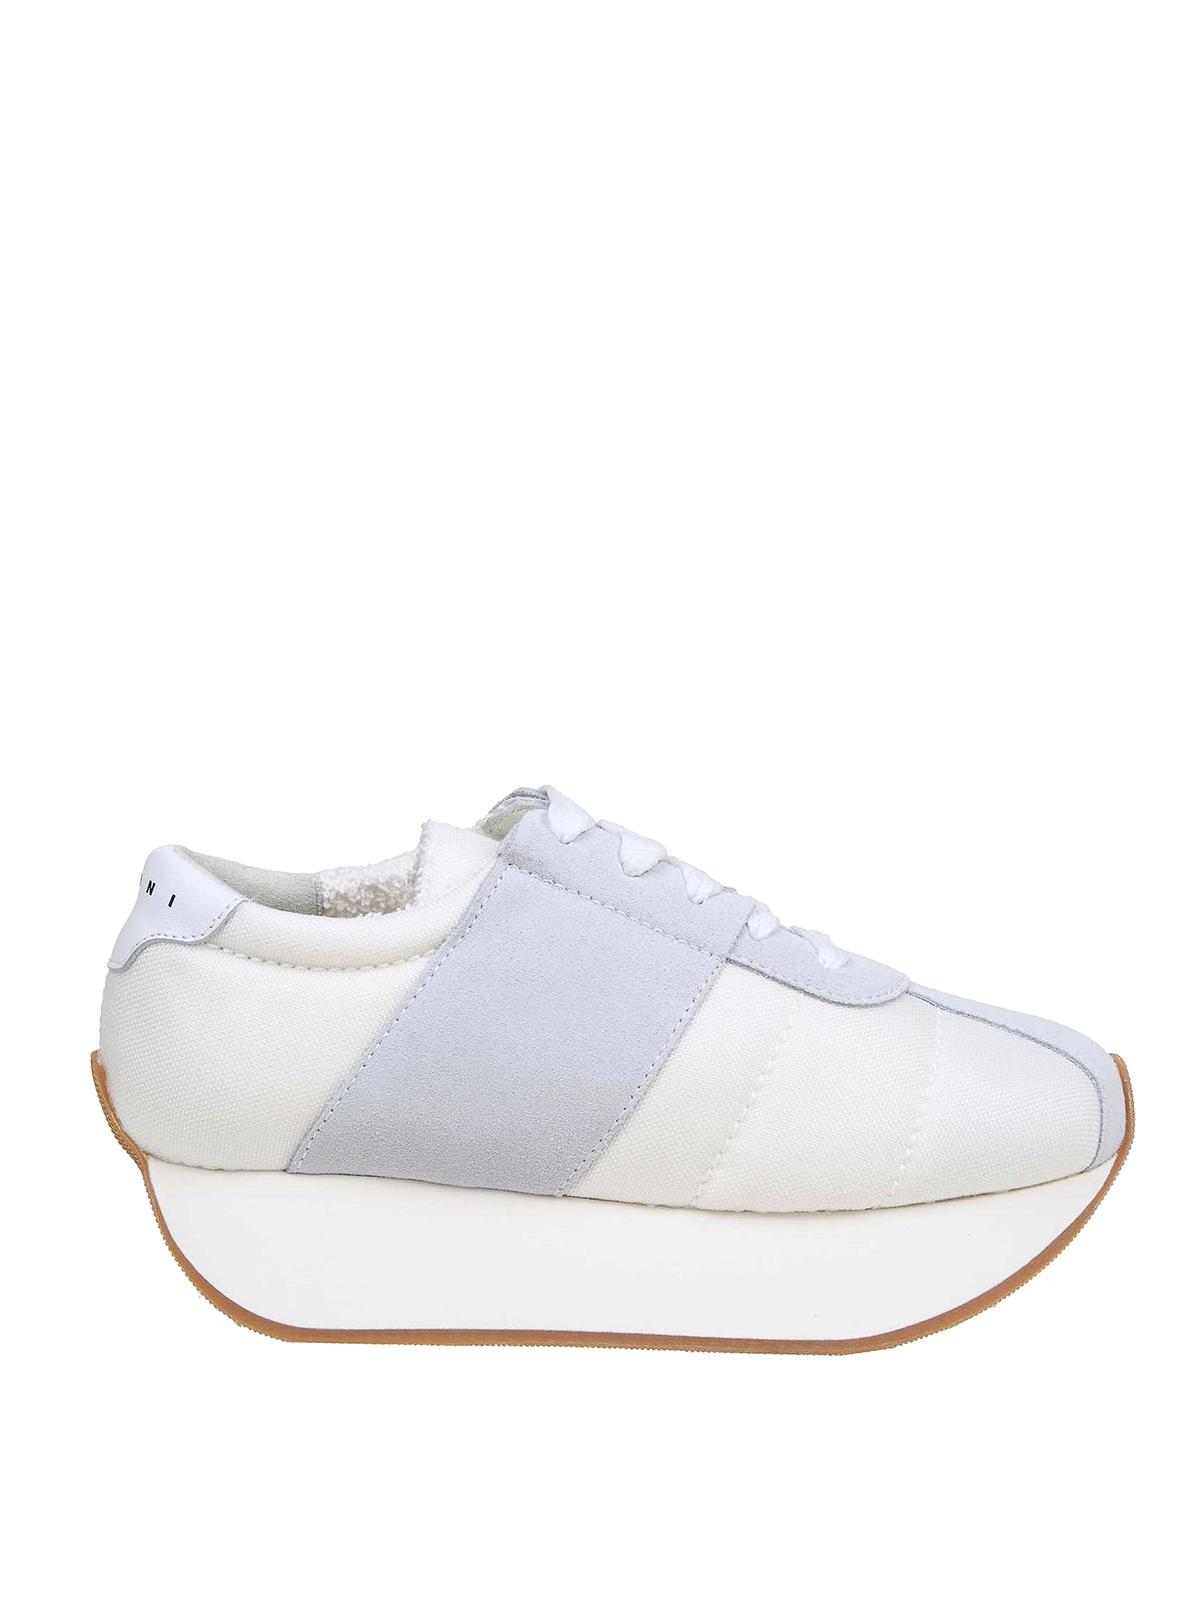 Marni - Bigfoot sneakers - trainers